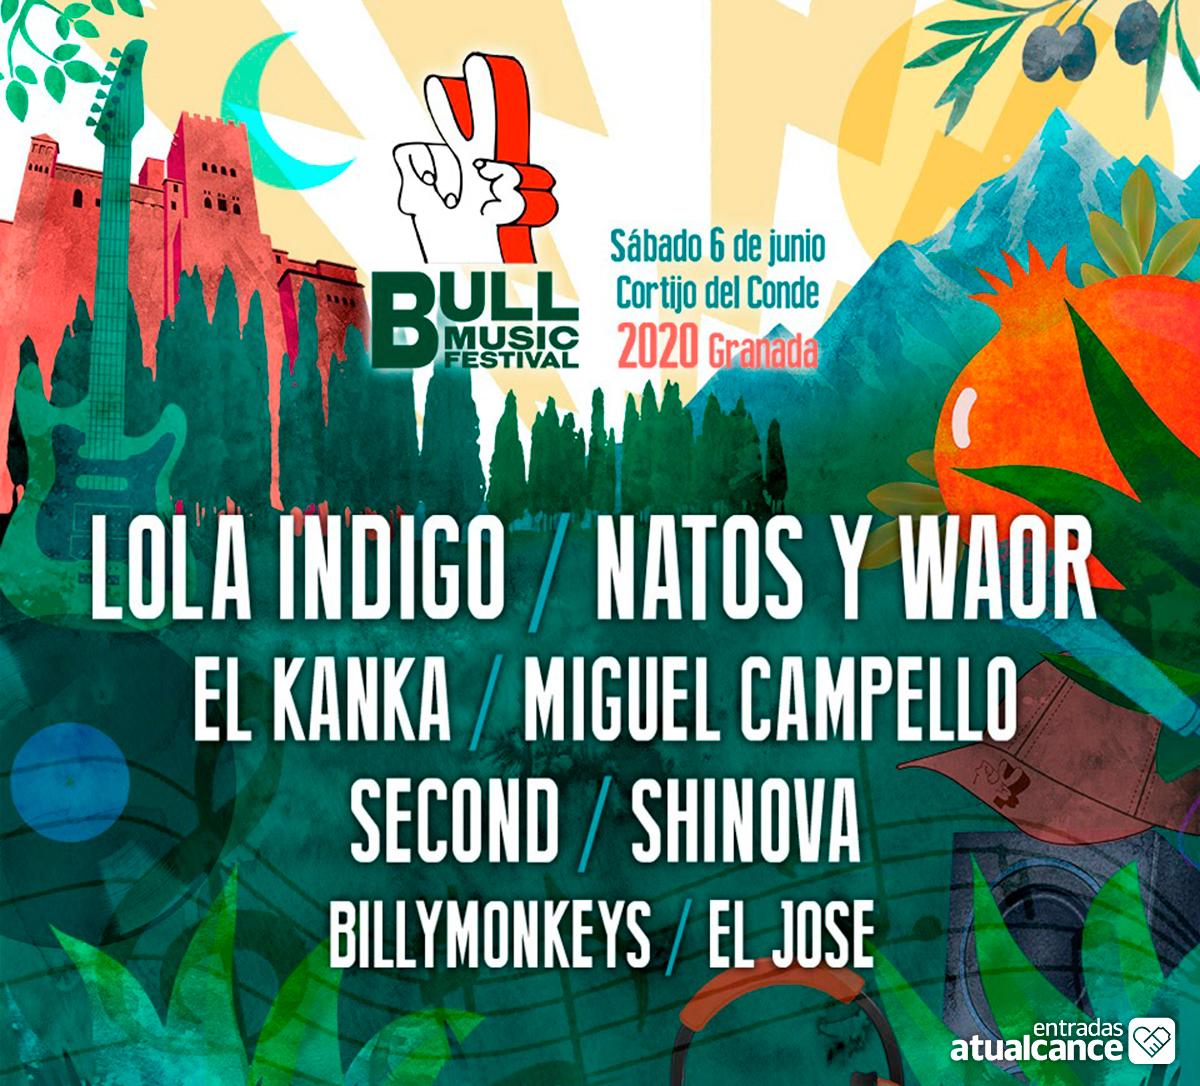 bull-music-festival-2020-5df8c53b9359b.jpeg